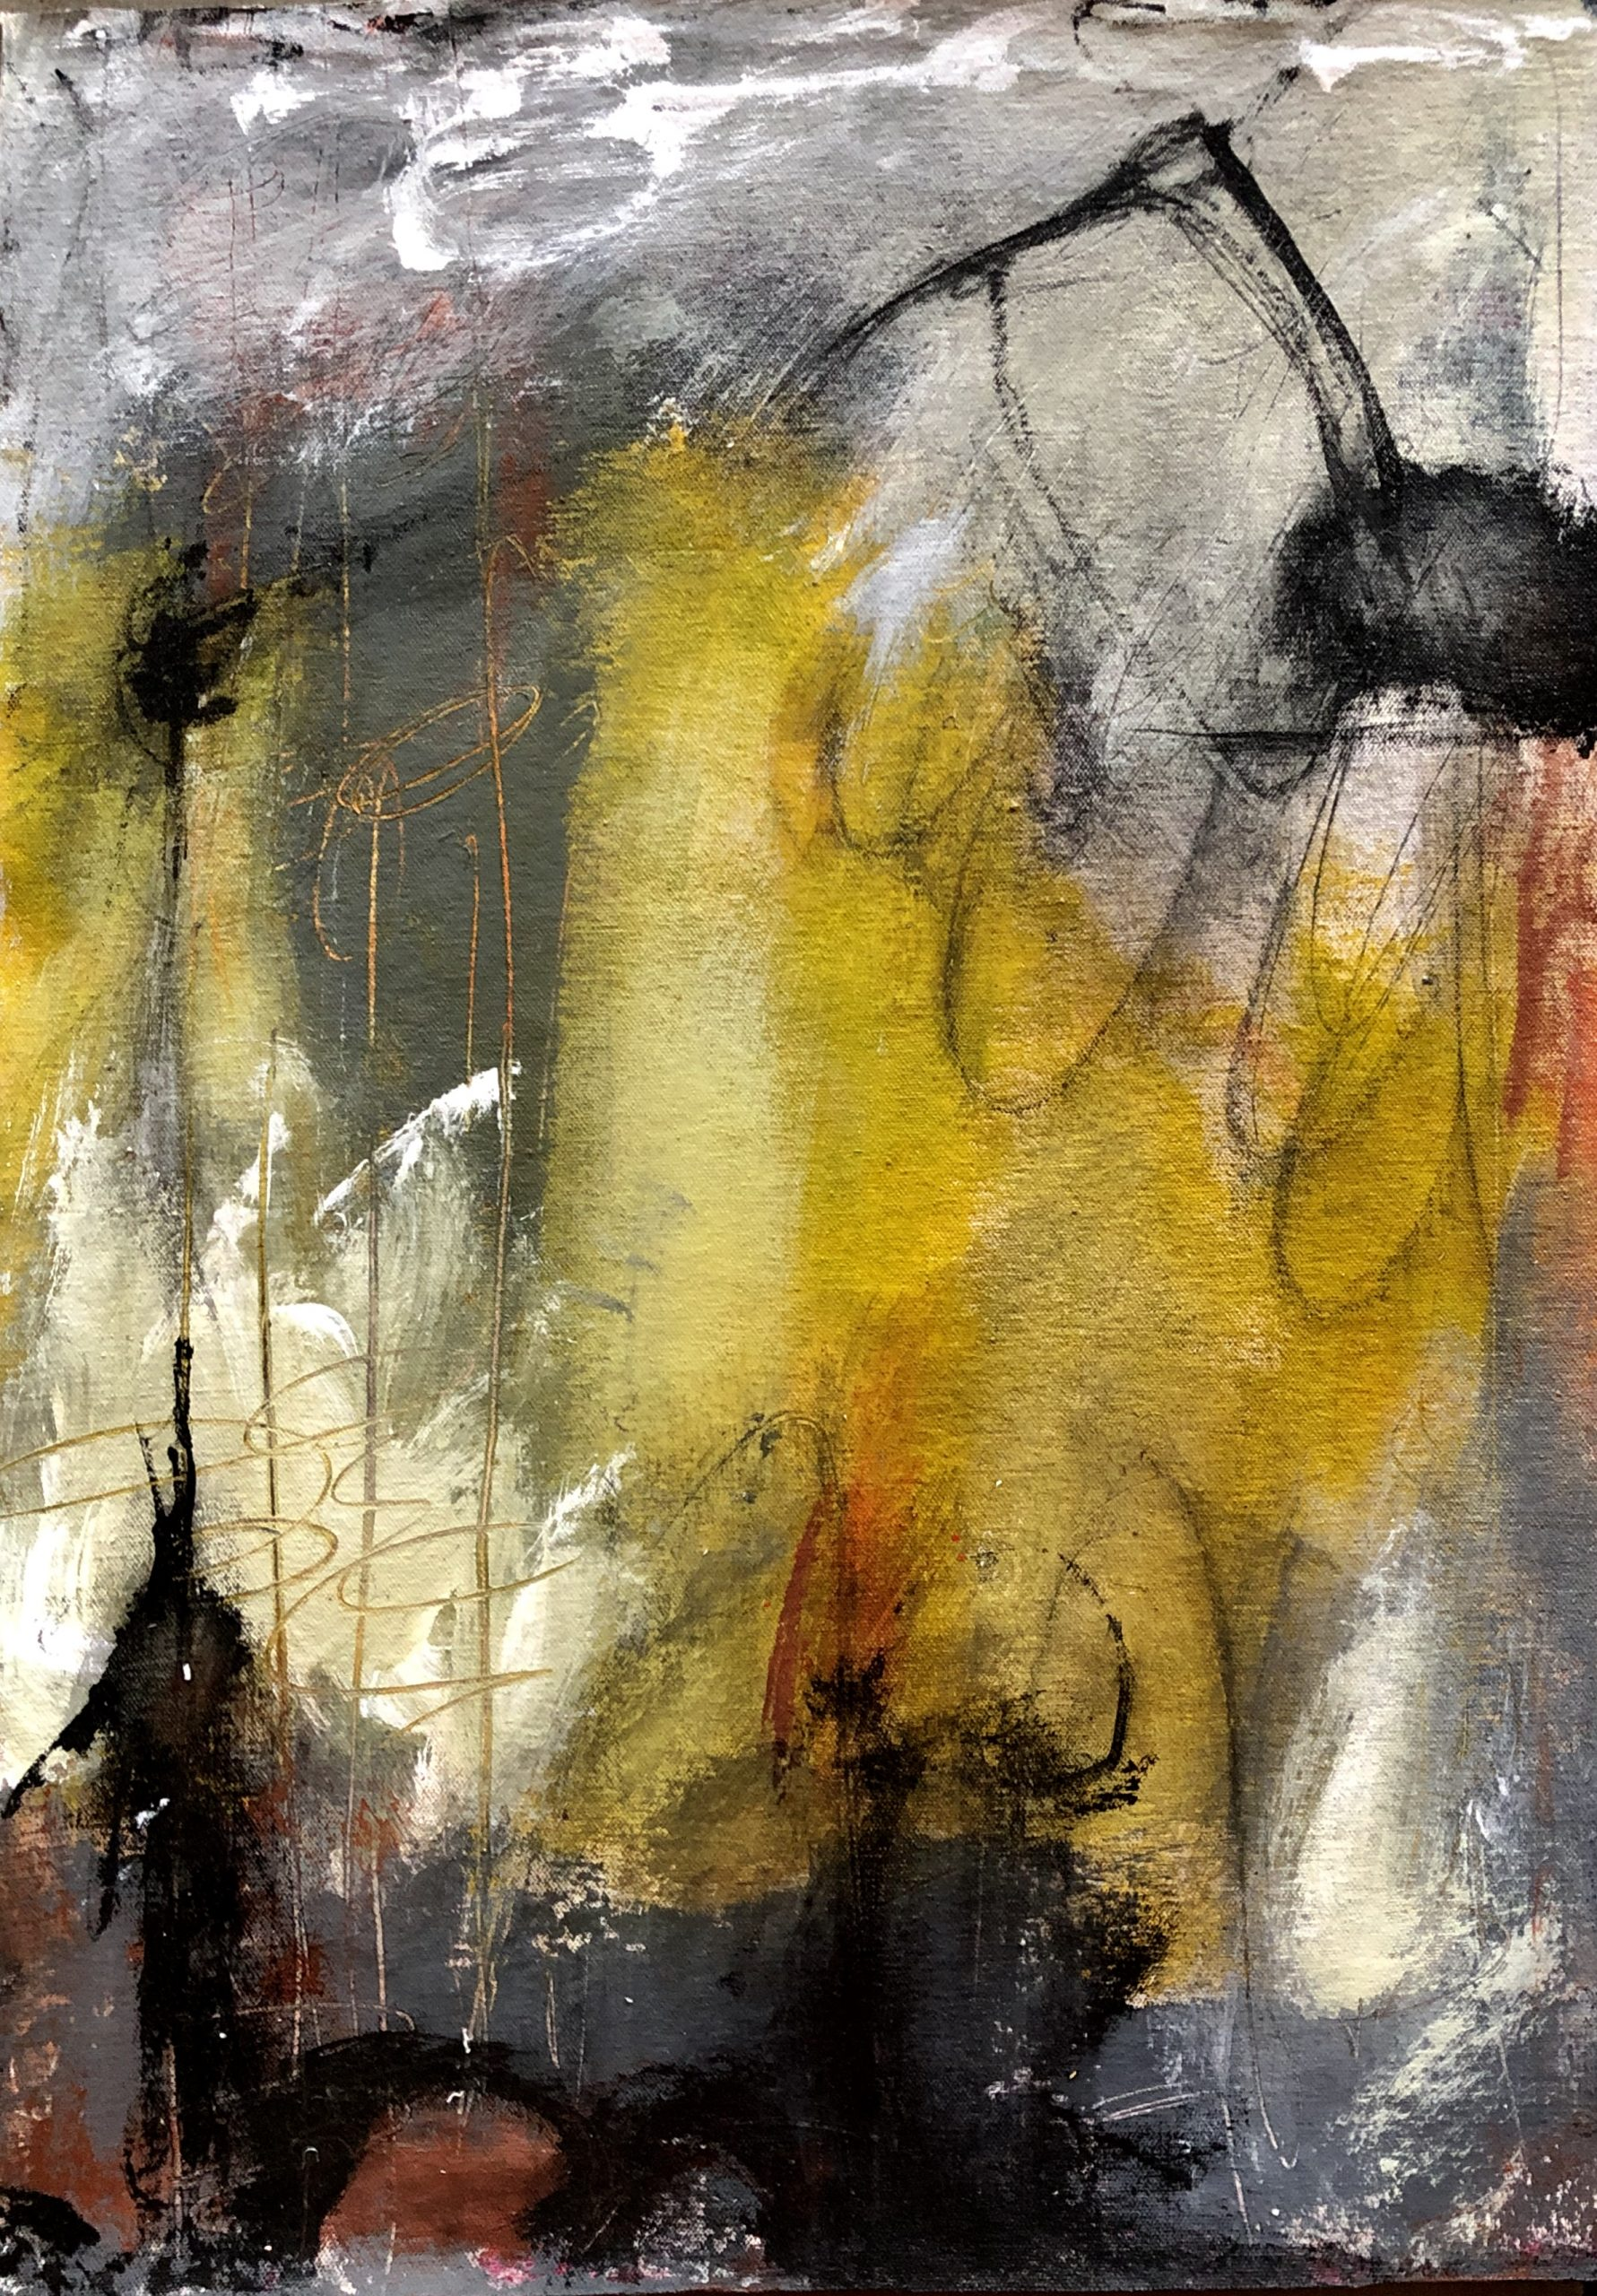 Entranced By the Rain 2, by San Diego abstract artist Ann Golumbuk